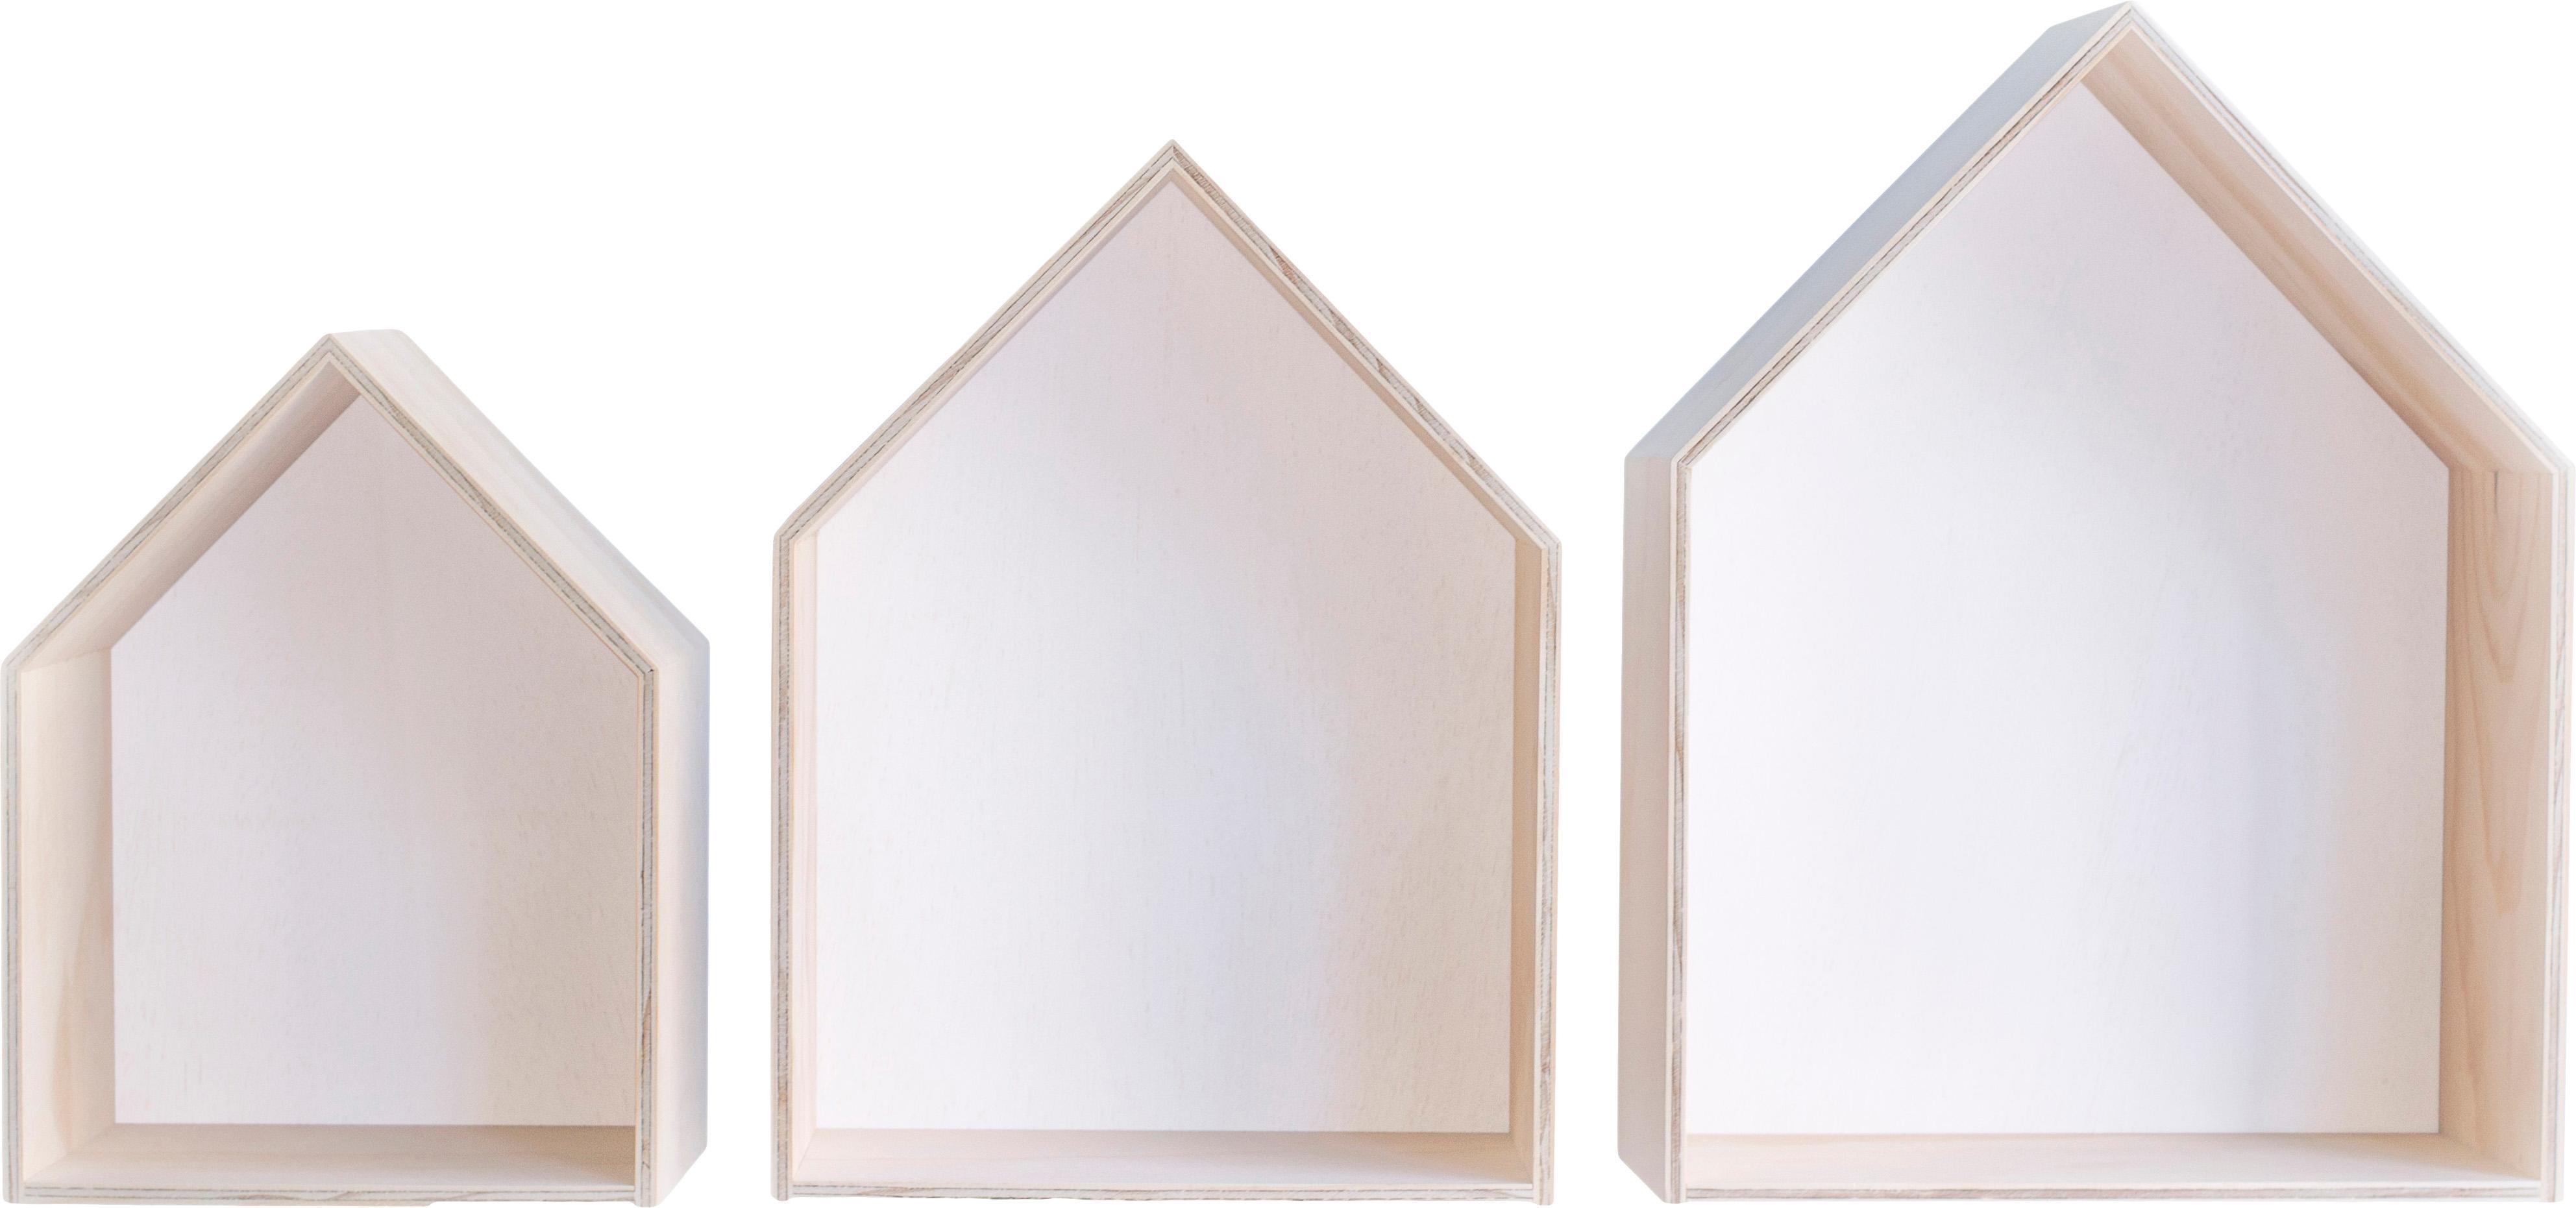 Wandregal-Set Blanca, 3-tlg., Sperrholz, Hellbraun, Weiß, Sondergrößen